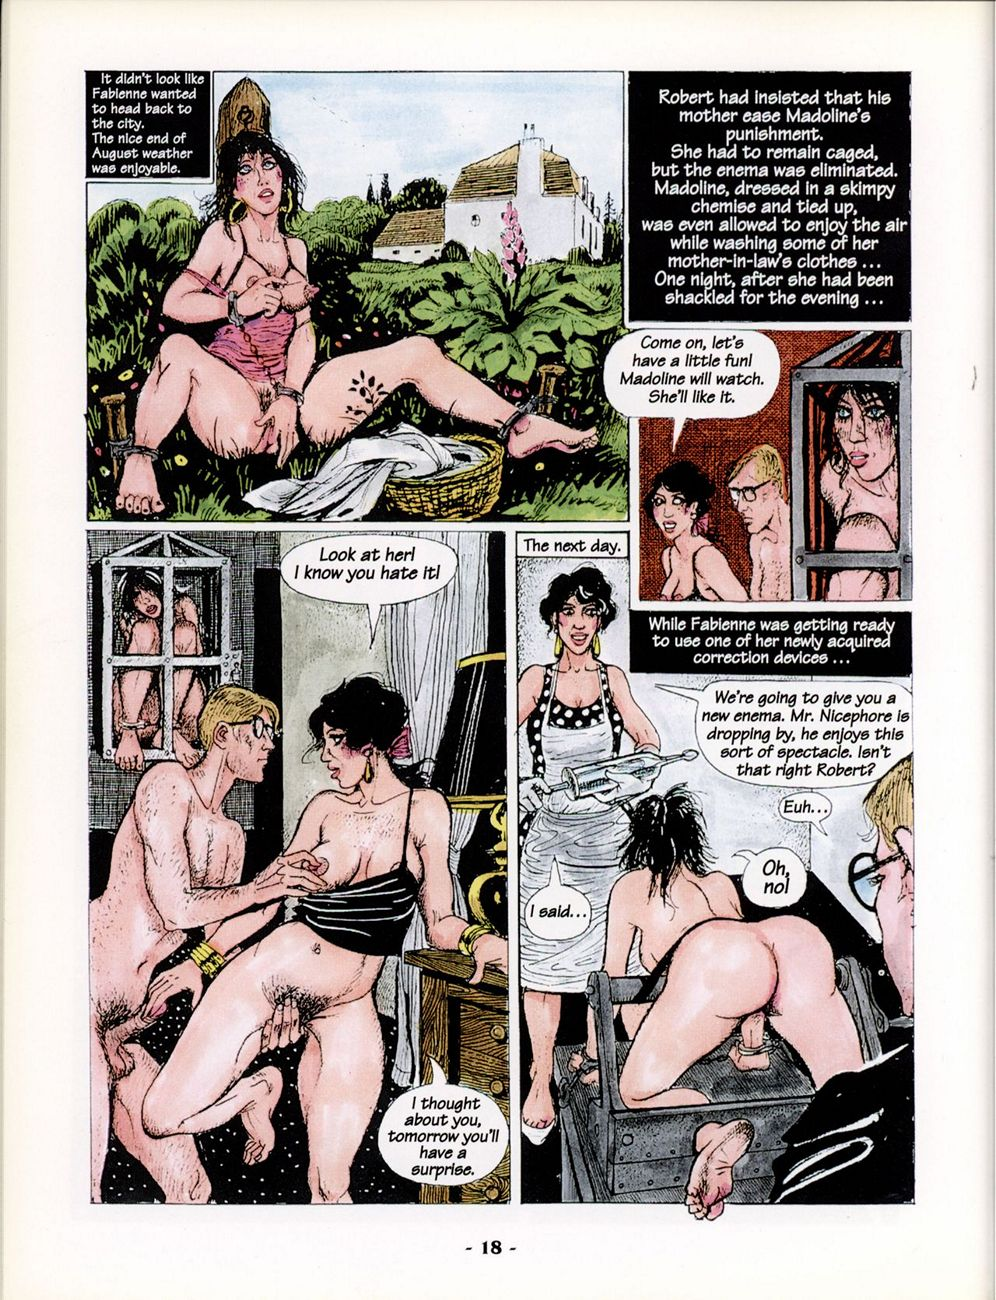 Air Porn One madoline 1 comic porn - hd porn comics